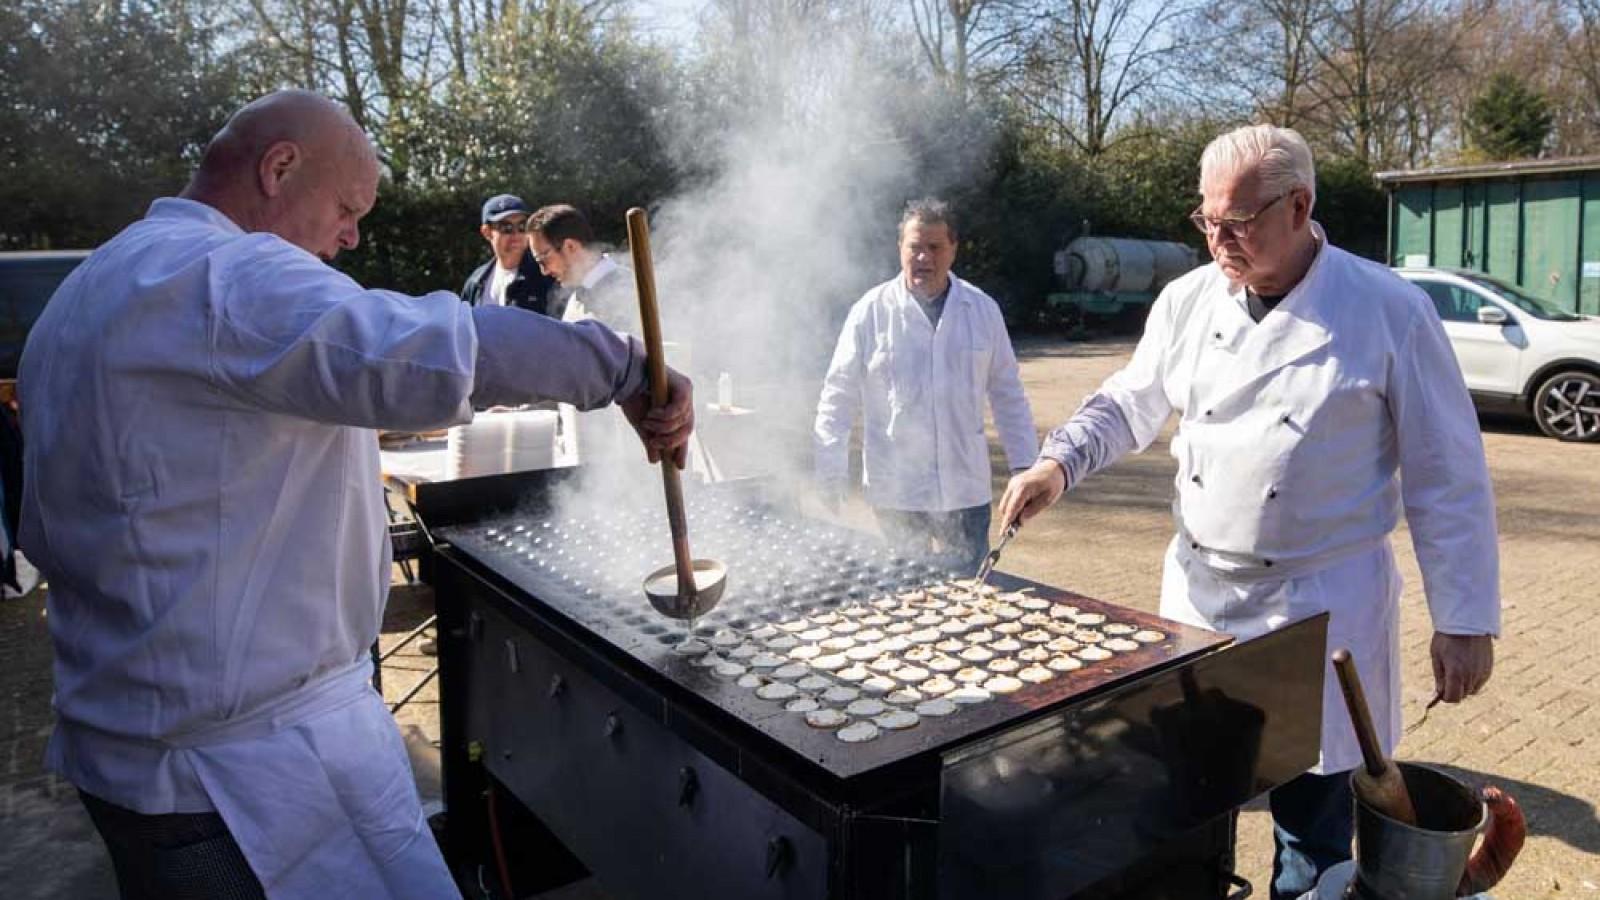 Larense poffertjeskraam bakt poffertjes voor lokale verzorgingshuizen